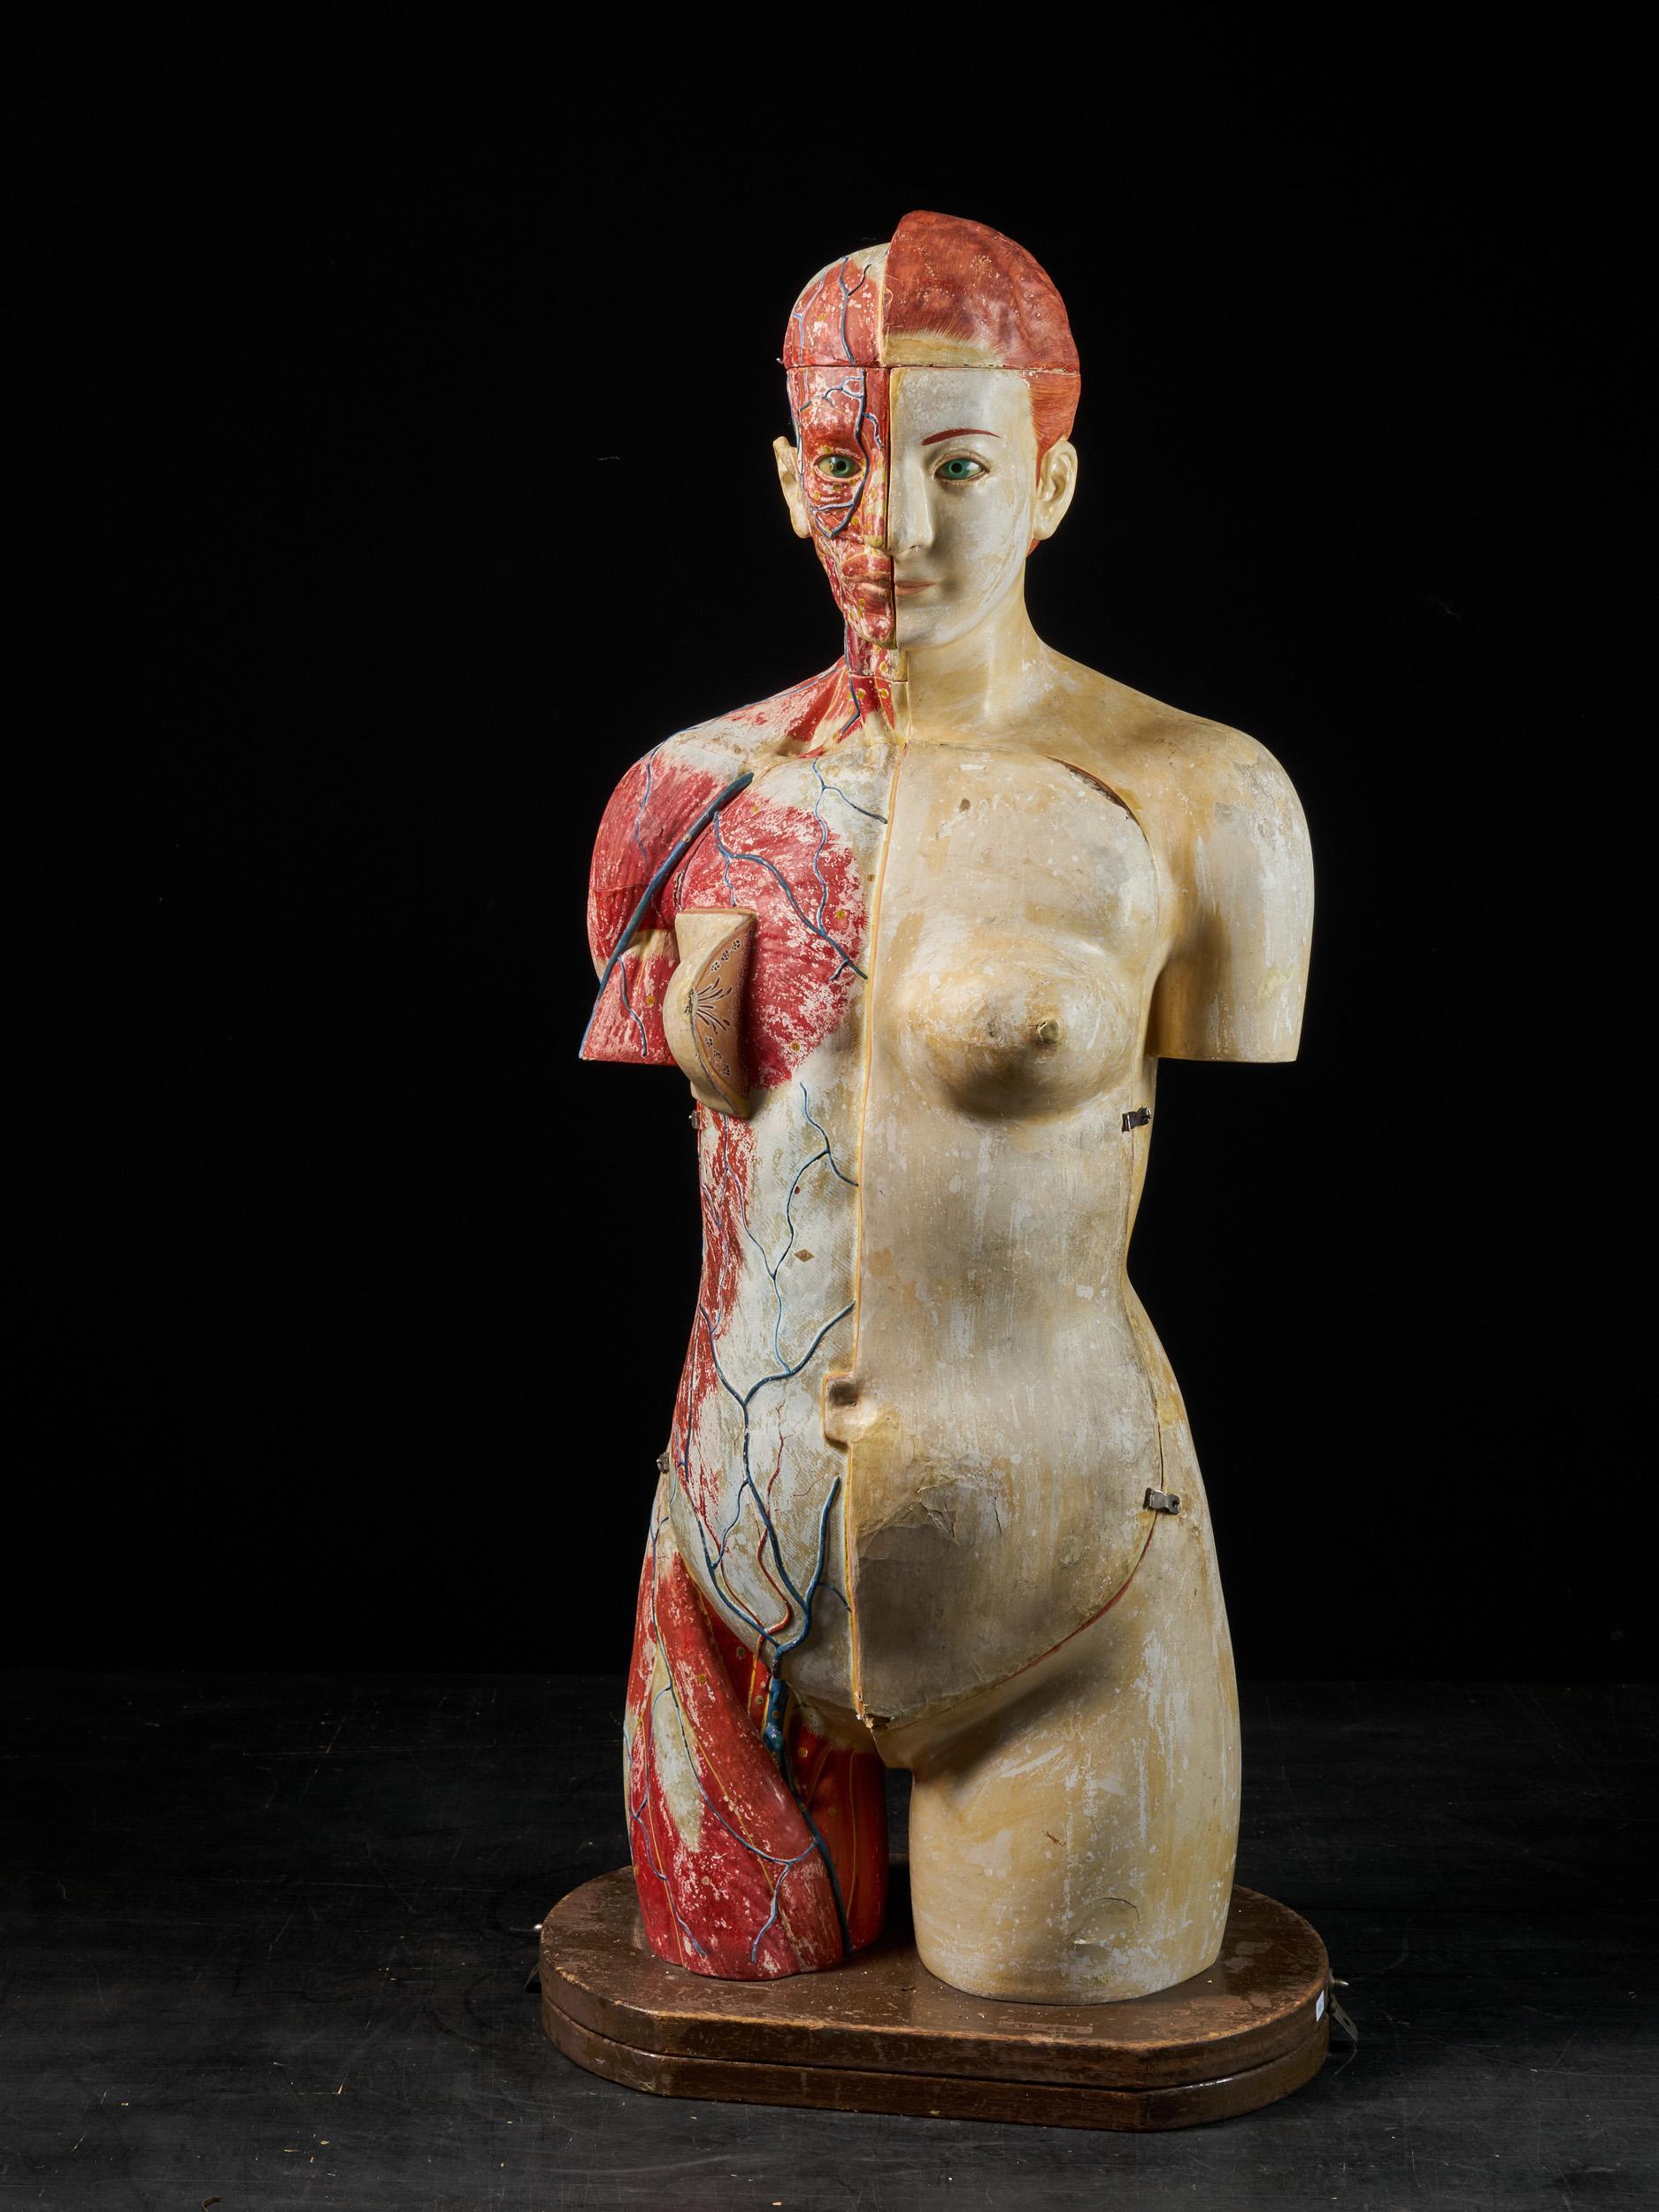 Female Life-size Anatomical Écorche Torso Model,Shimadzu Company, Japan